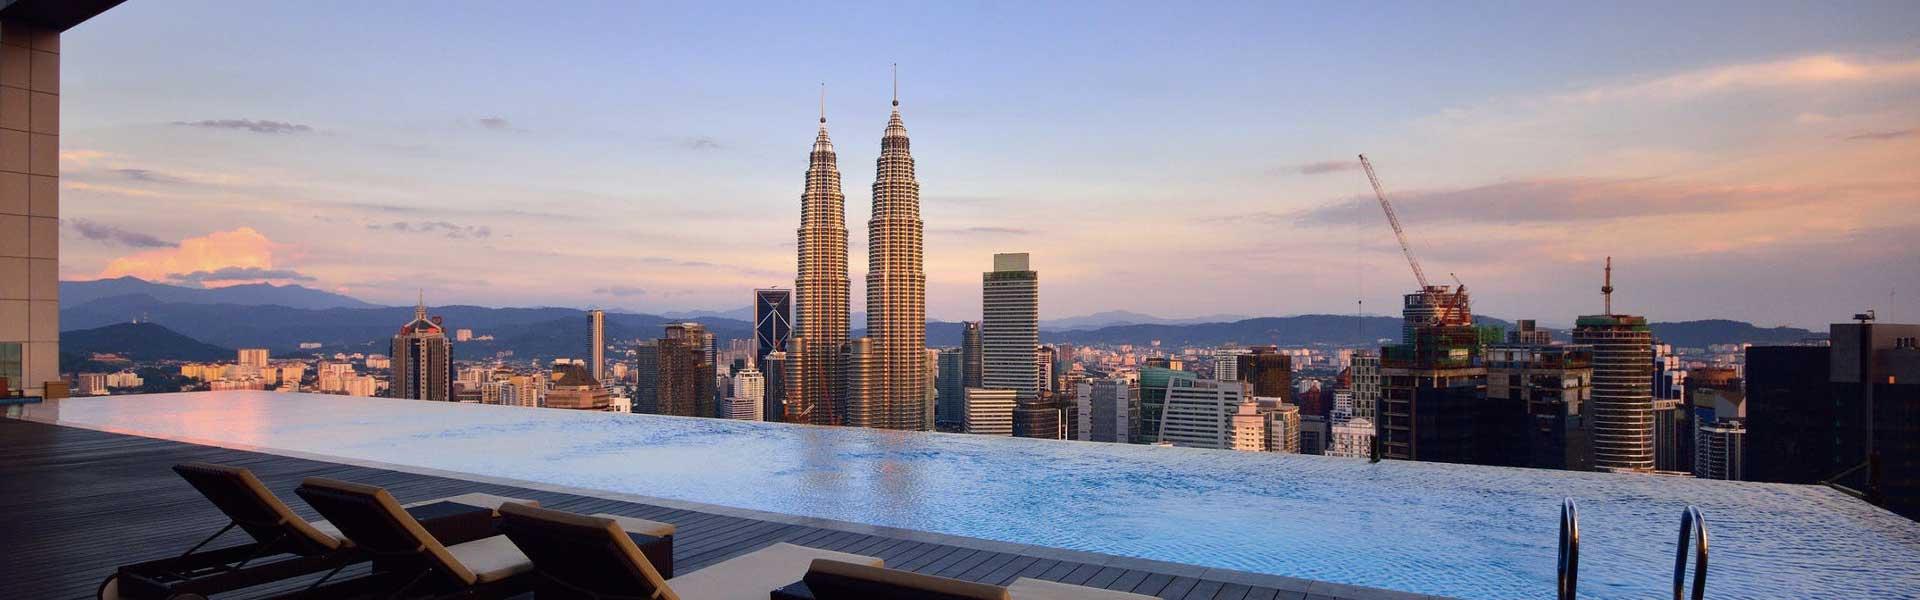 kl hotel skyline